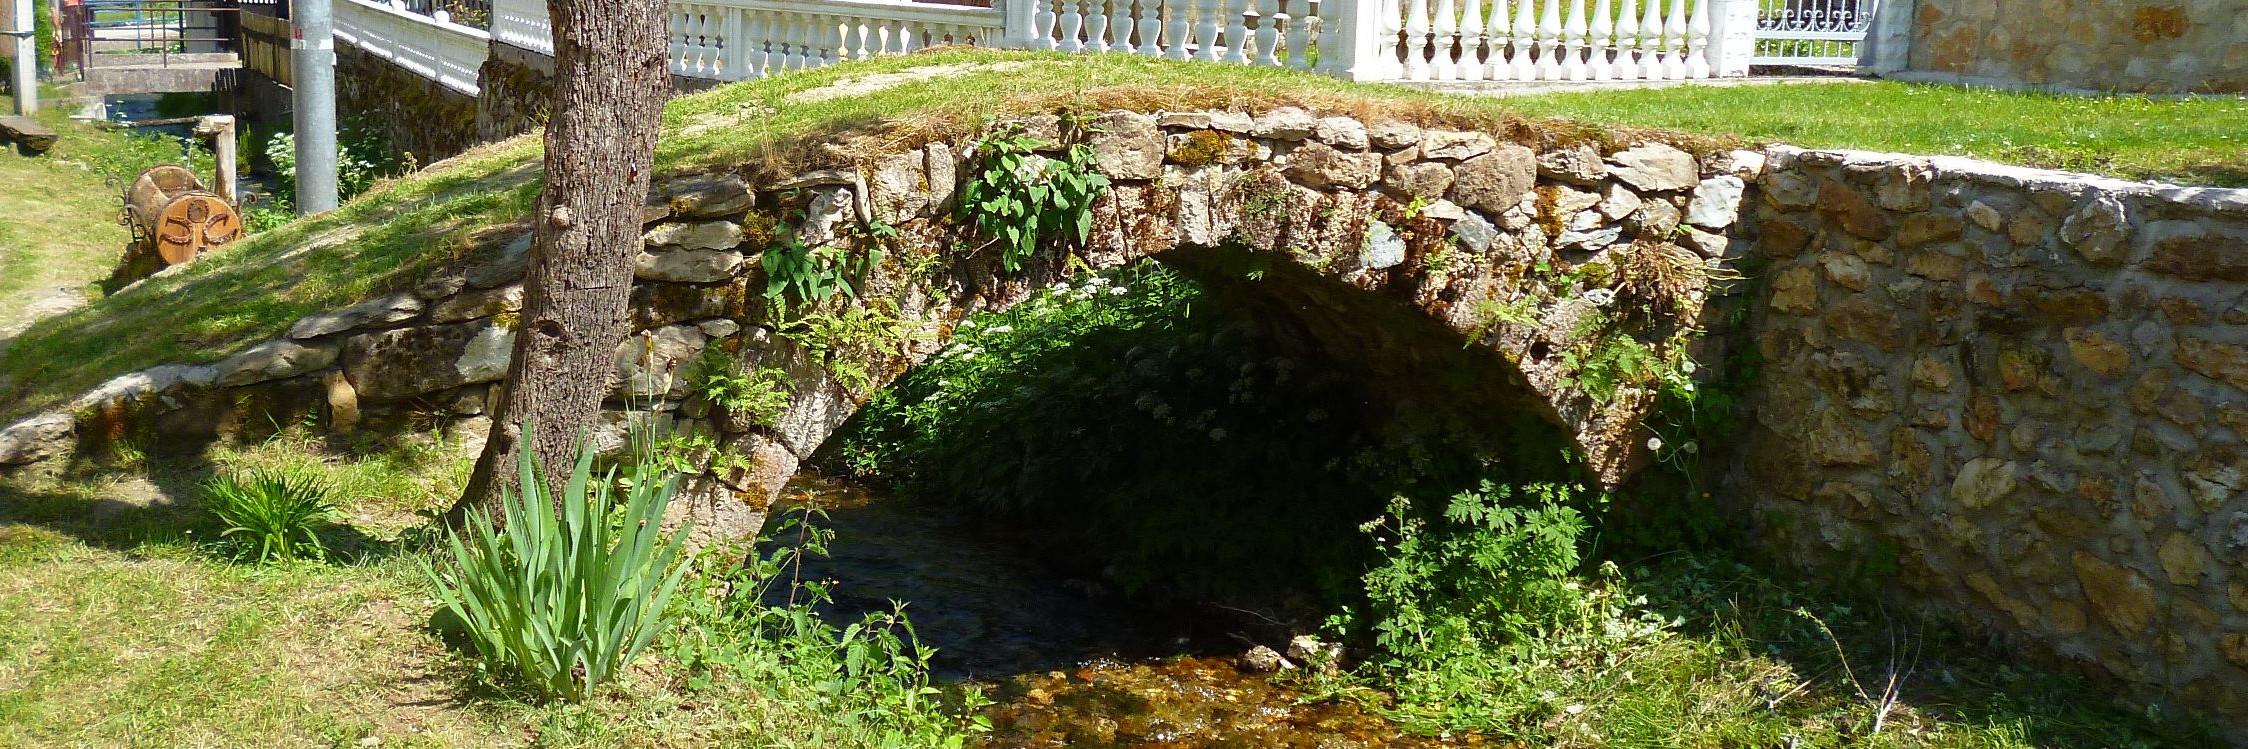 Римский мост (Вранци)